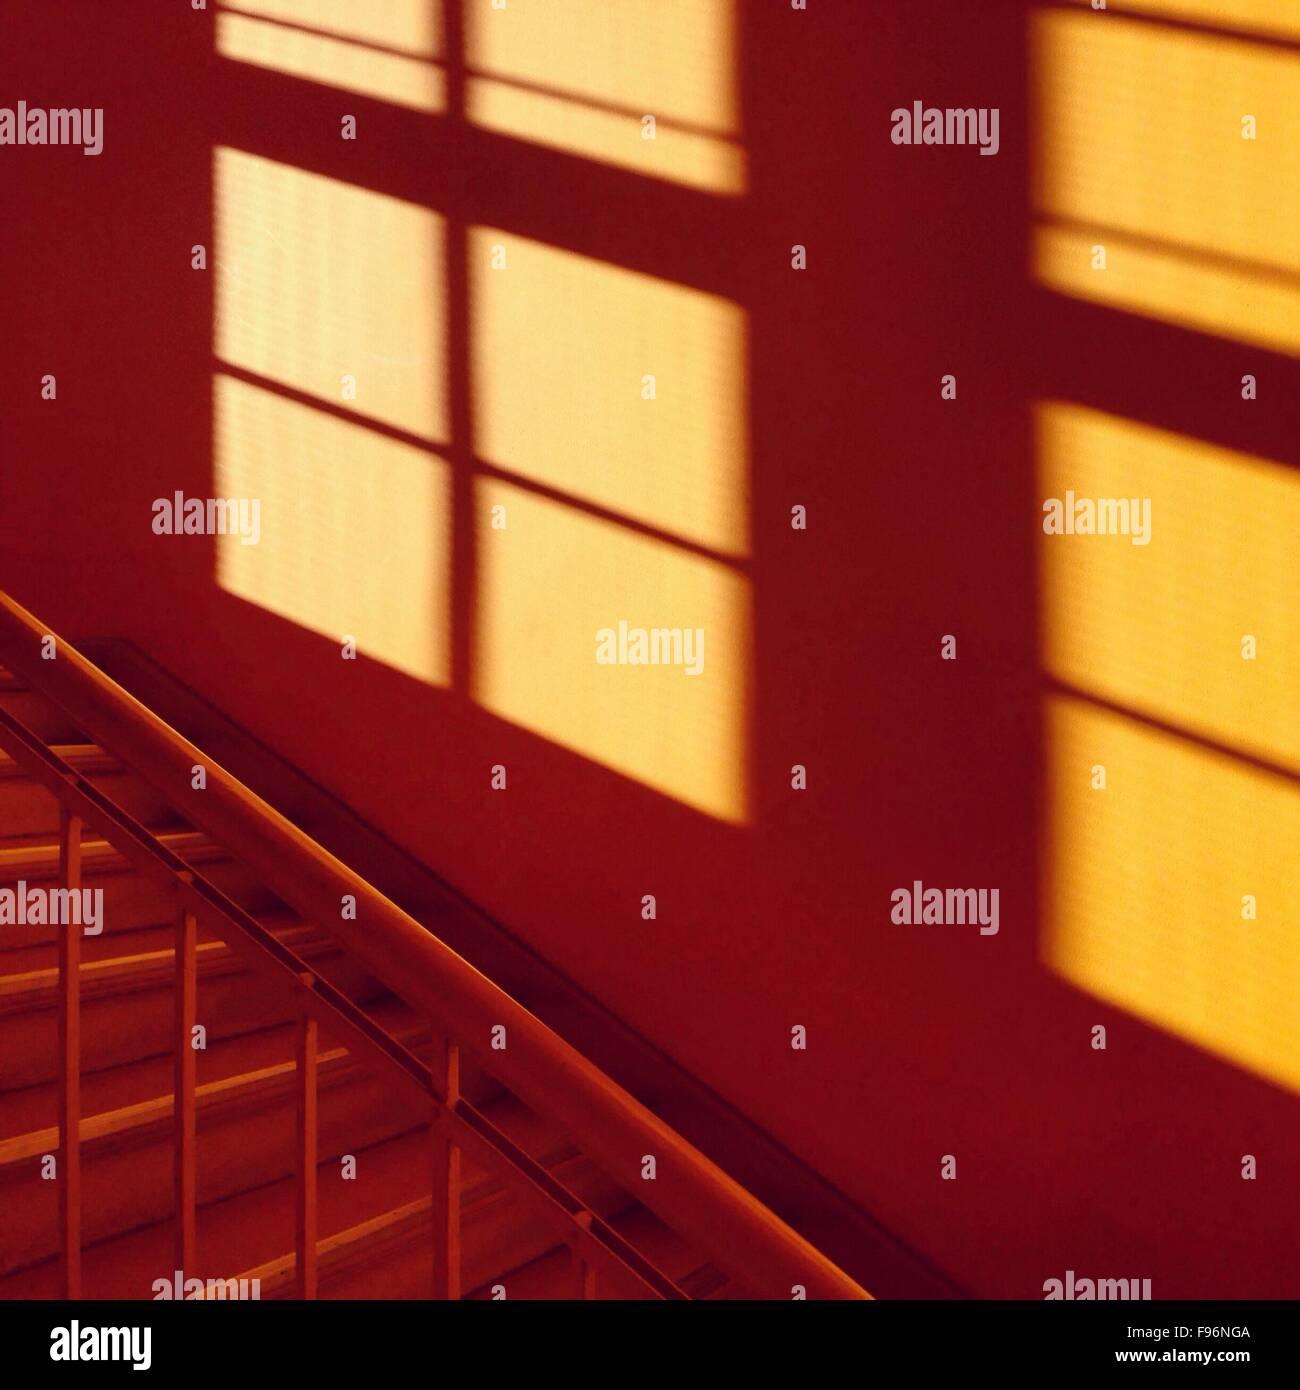 Primer plano de escaleras recortadas Imagen De Stock